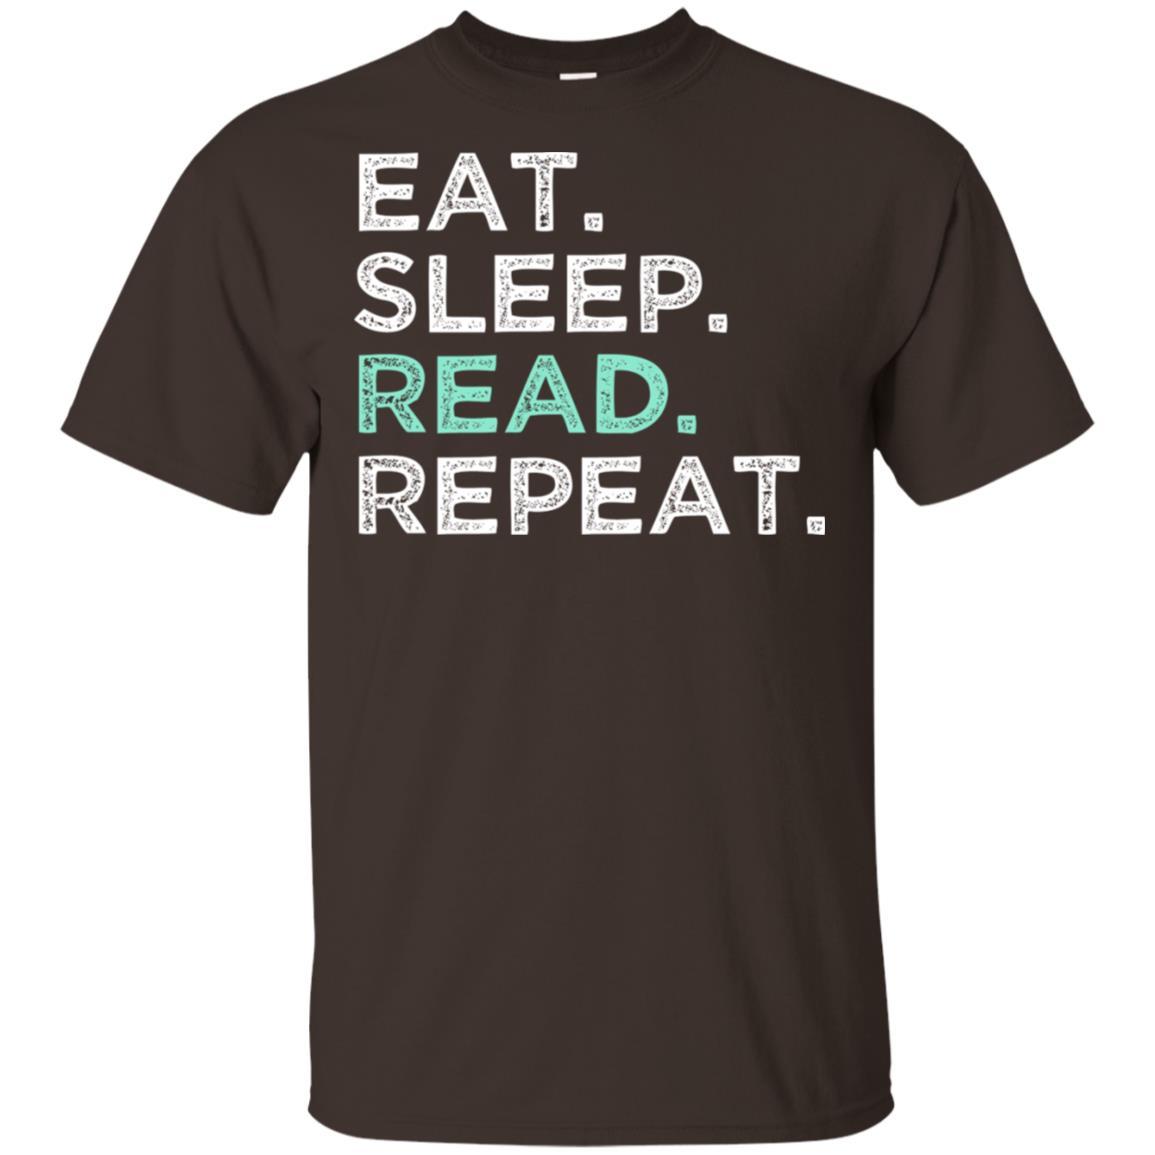 Eat Sleep Read Repeat. Funny Reading Unisex Short Sleeve